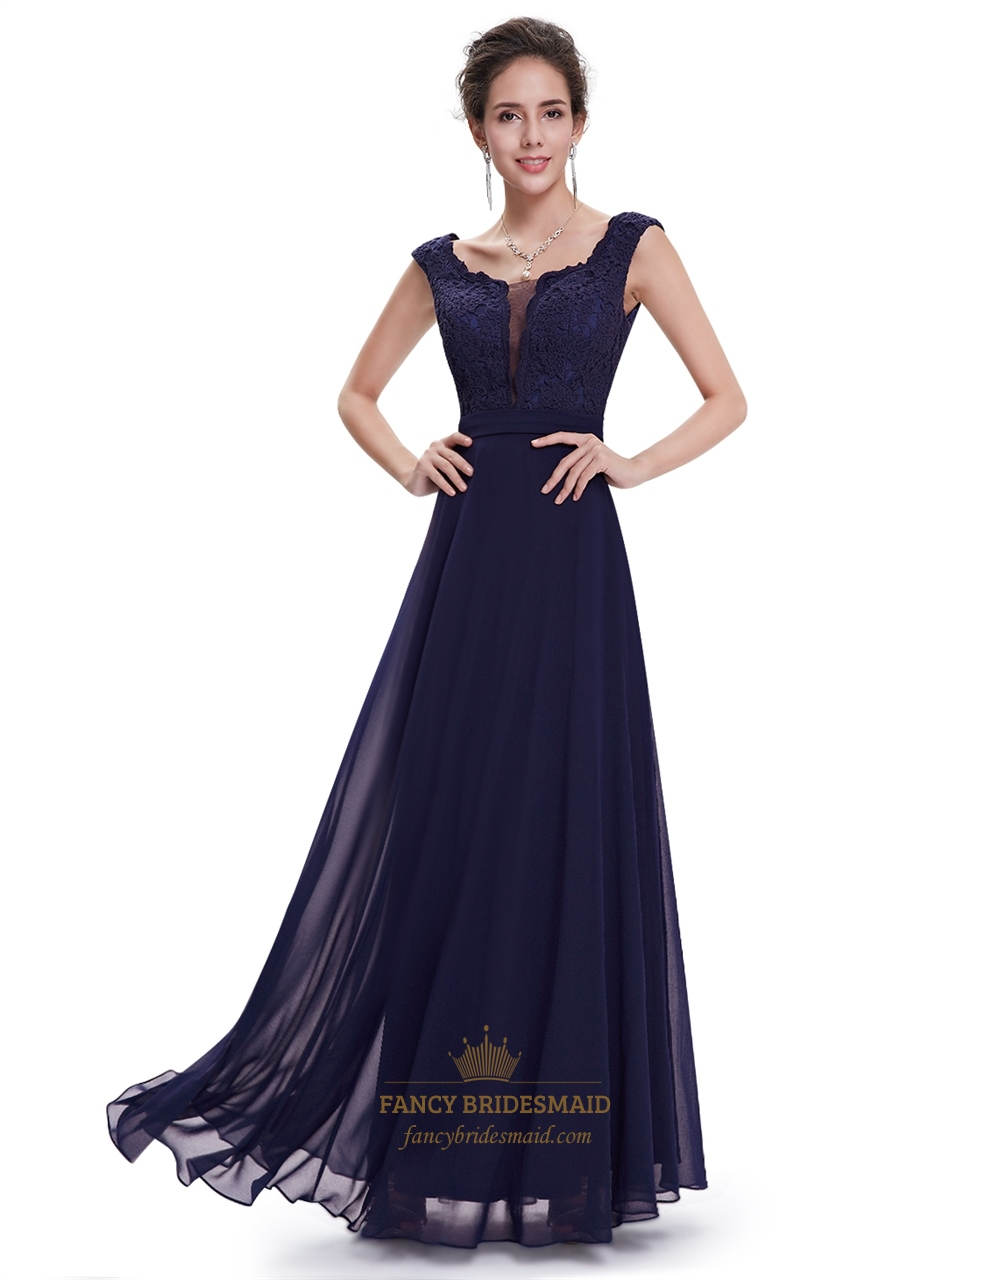 Navy Blue Chiffon Cap Sleeves Long Bridesmaid Dresses With